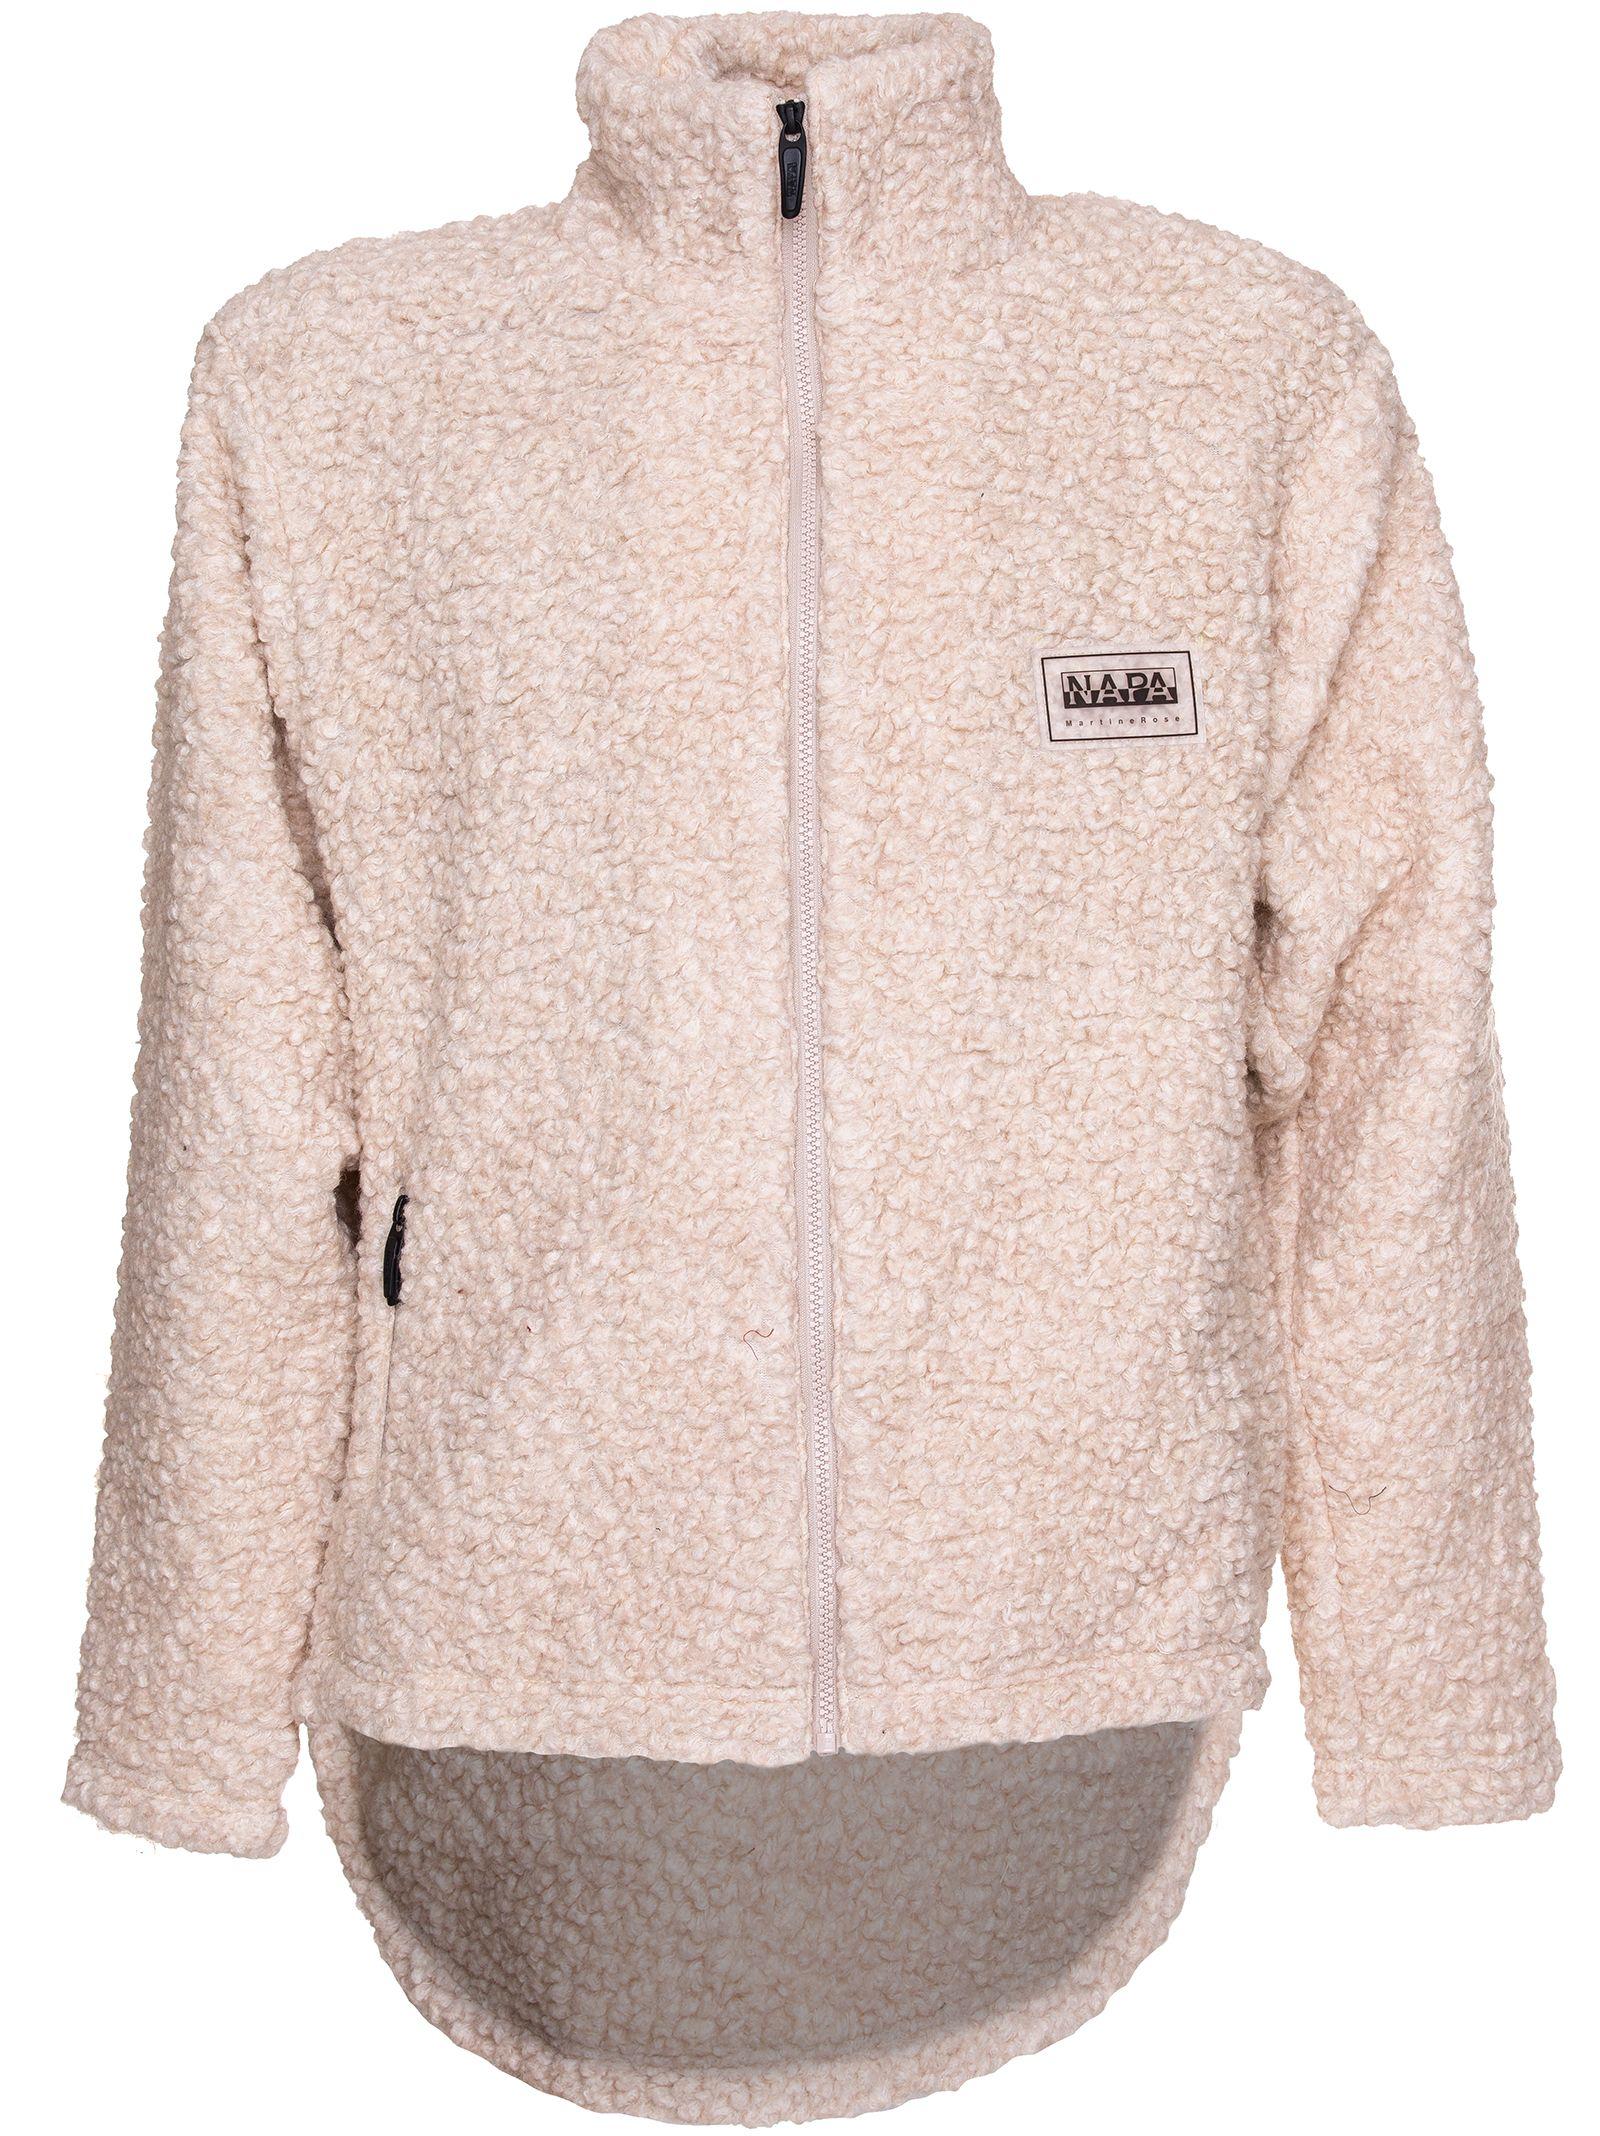 Napa By Martin Rose Sherpa Sweater, Beige